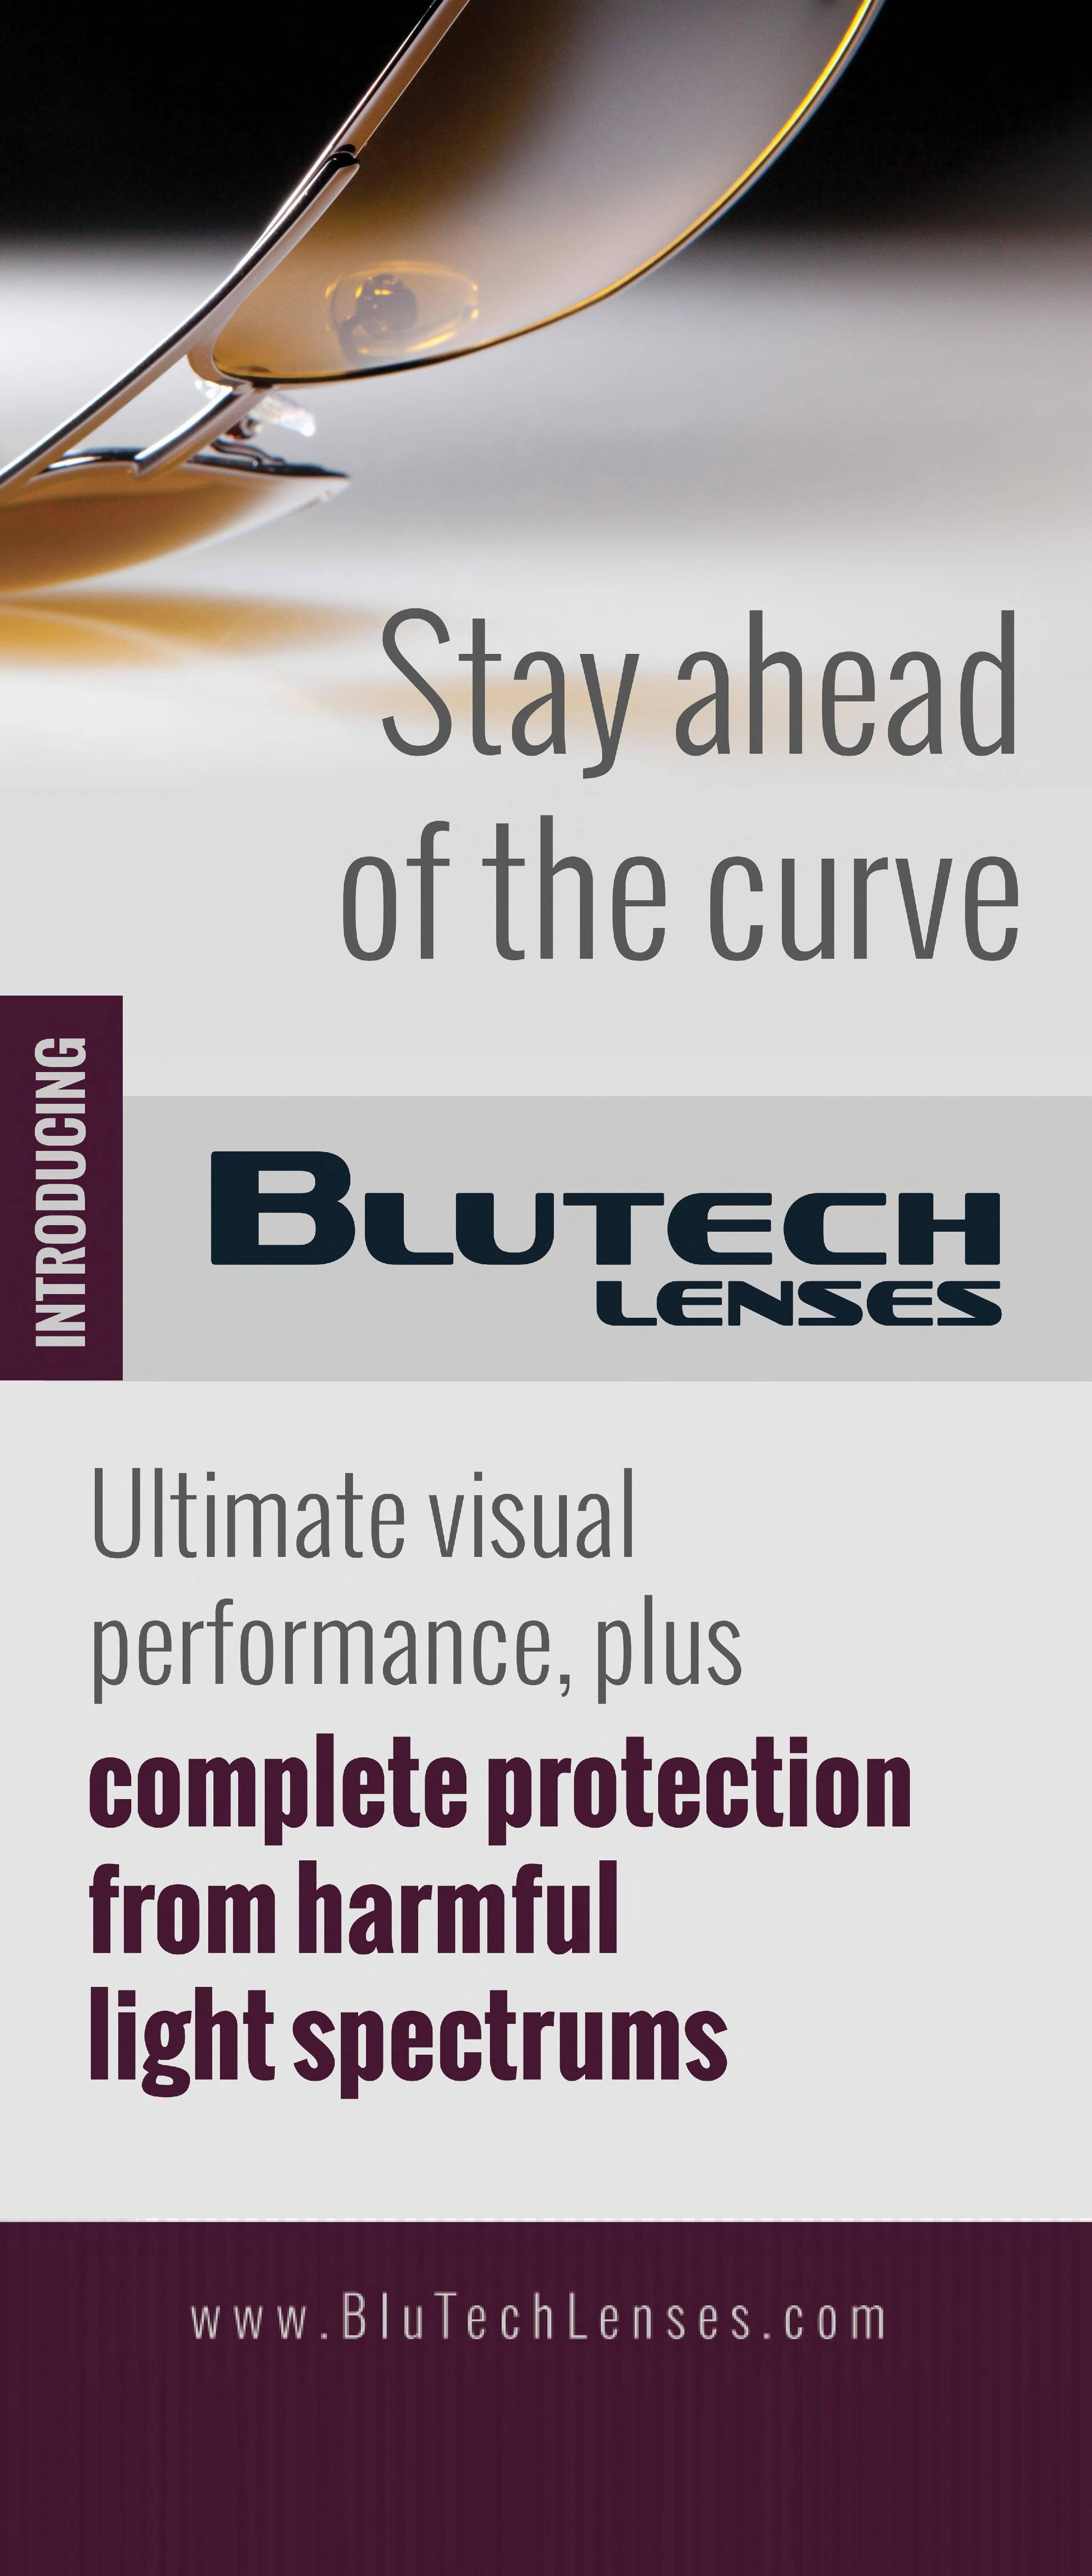 1 BluTech banner v1 page 001 1